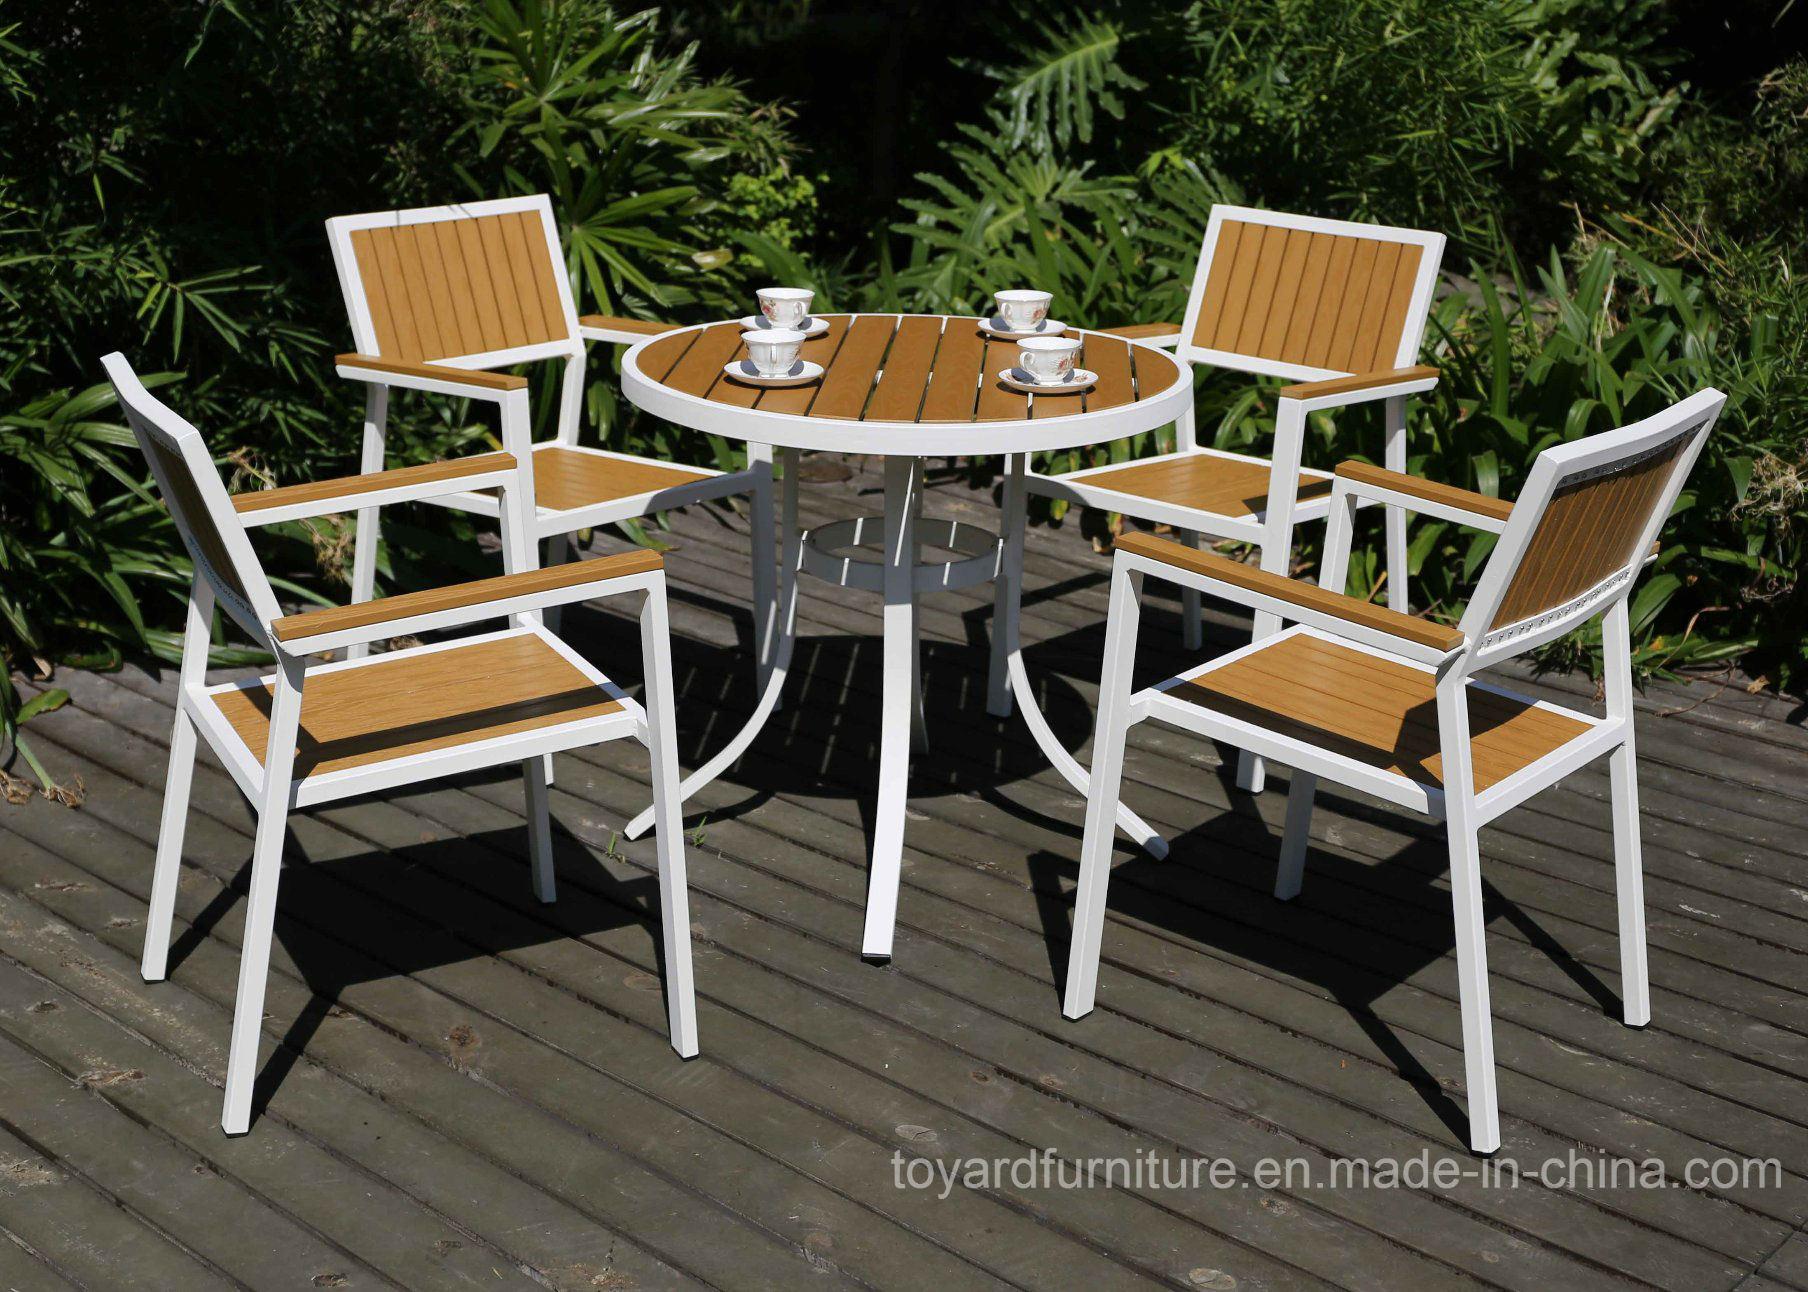 china best chocies modern outdoor leisure furniture aluminum wooden